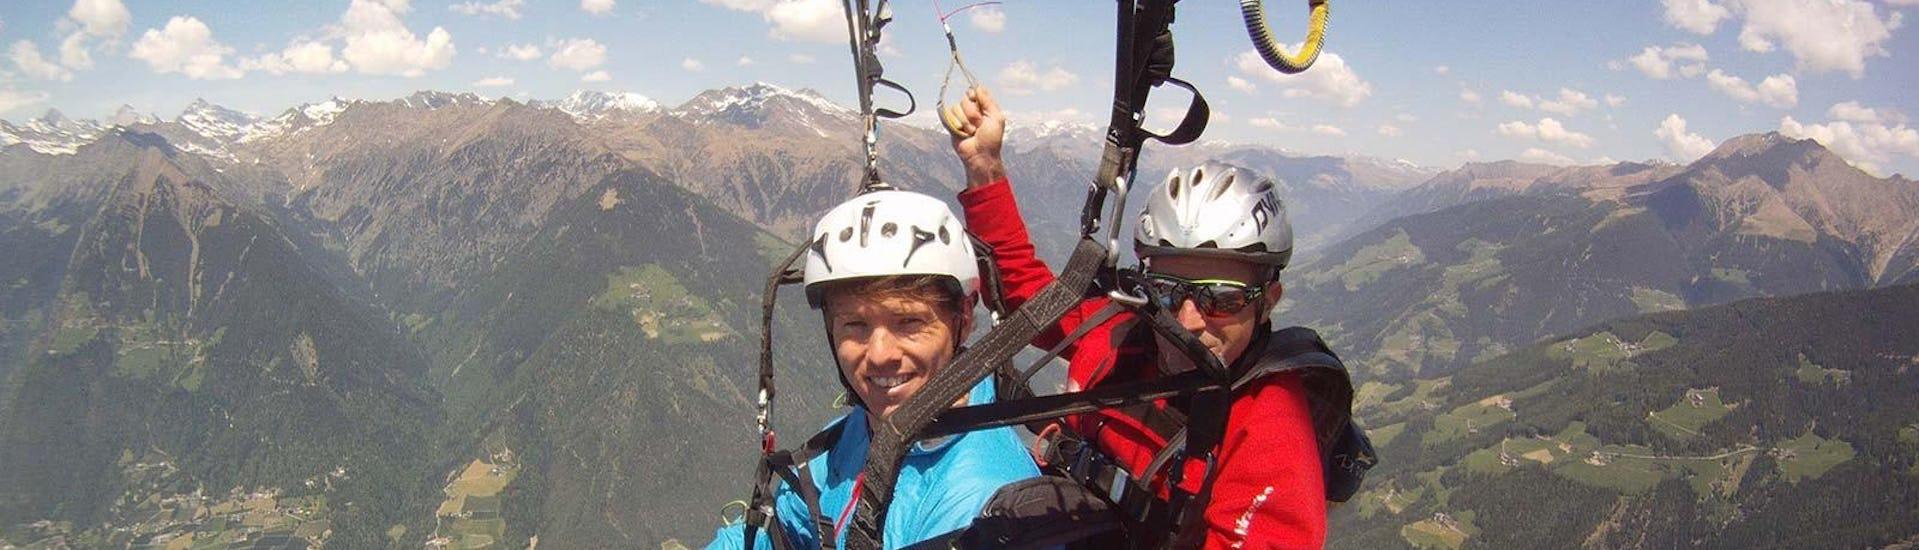 paragliding-at-punta-cervina-mountain-station-flight-flyhirzer-hero